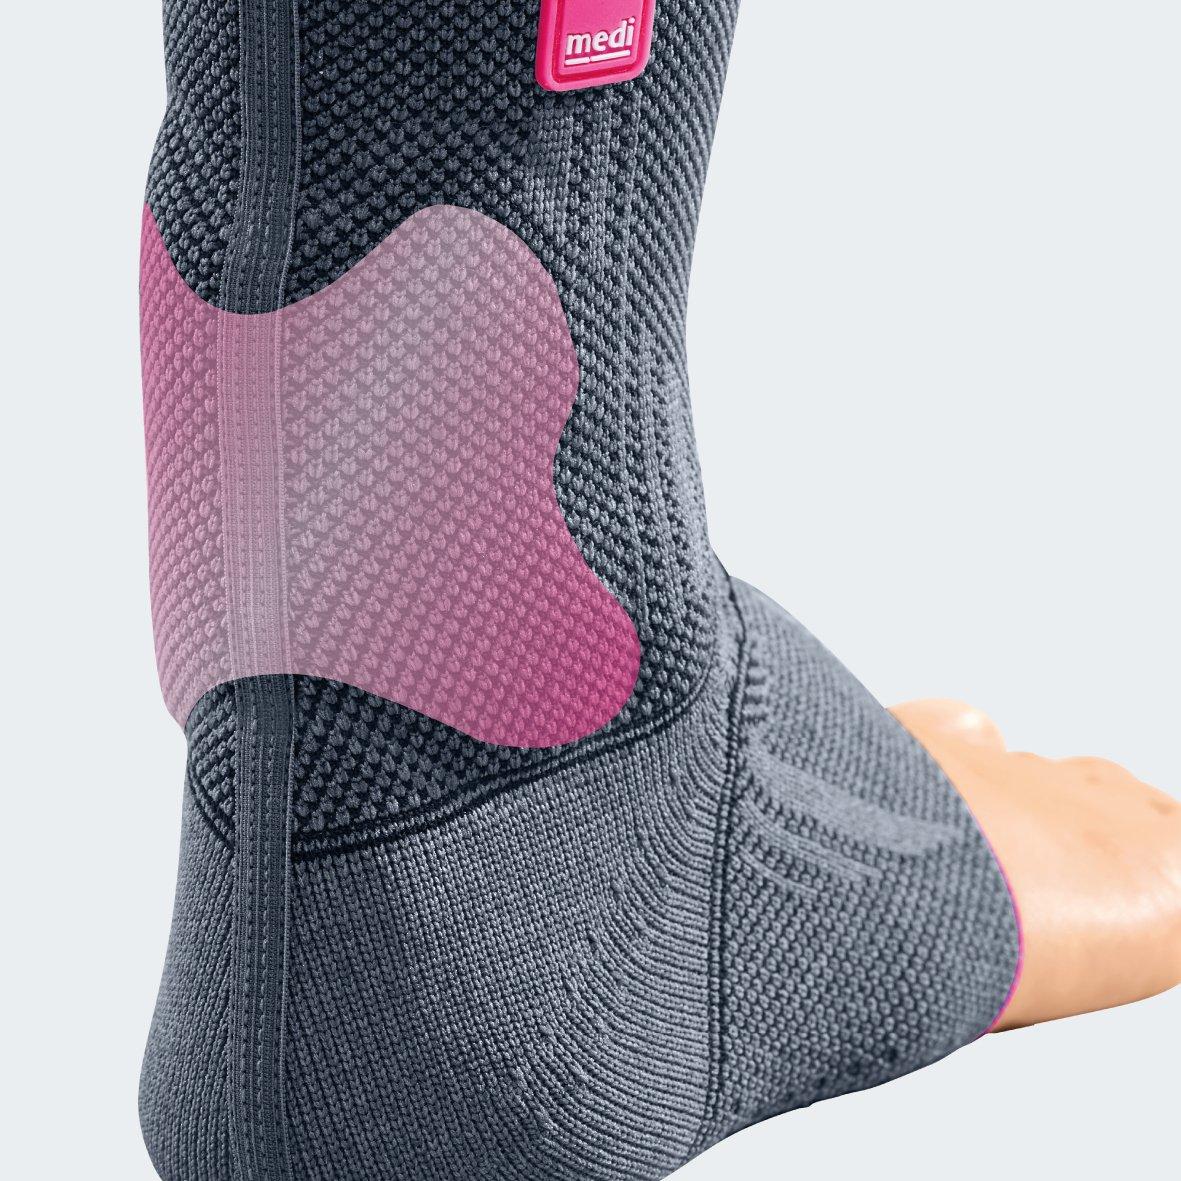 Medi Achimed Knit Ankle Support for Men & Women (Silver) Size I by Medi Ortho (Image #2)